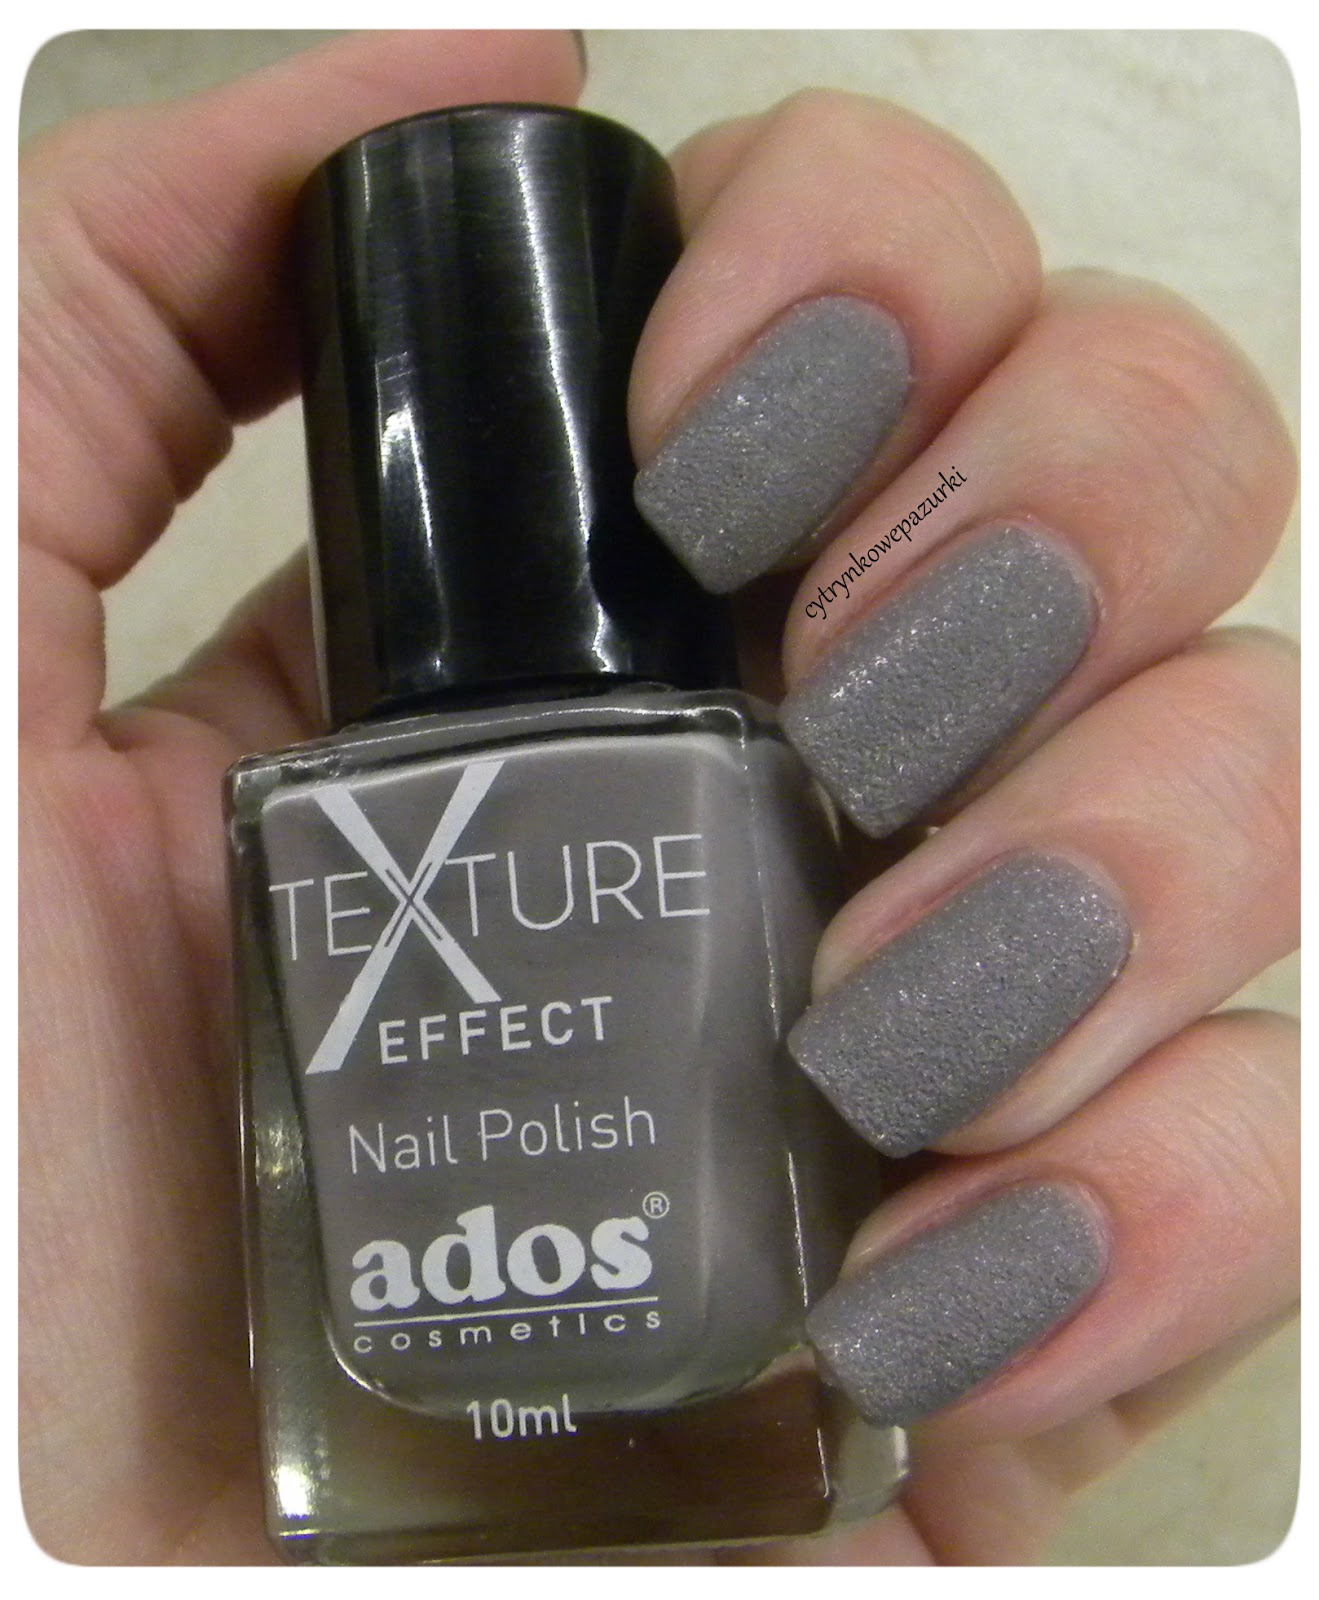 Ados Texture Effect 02